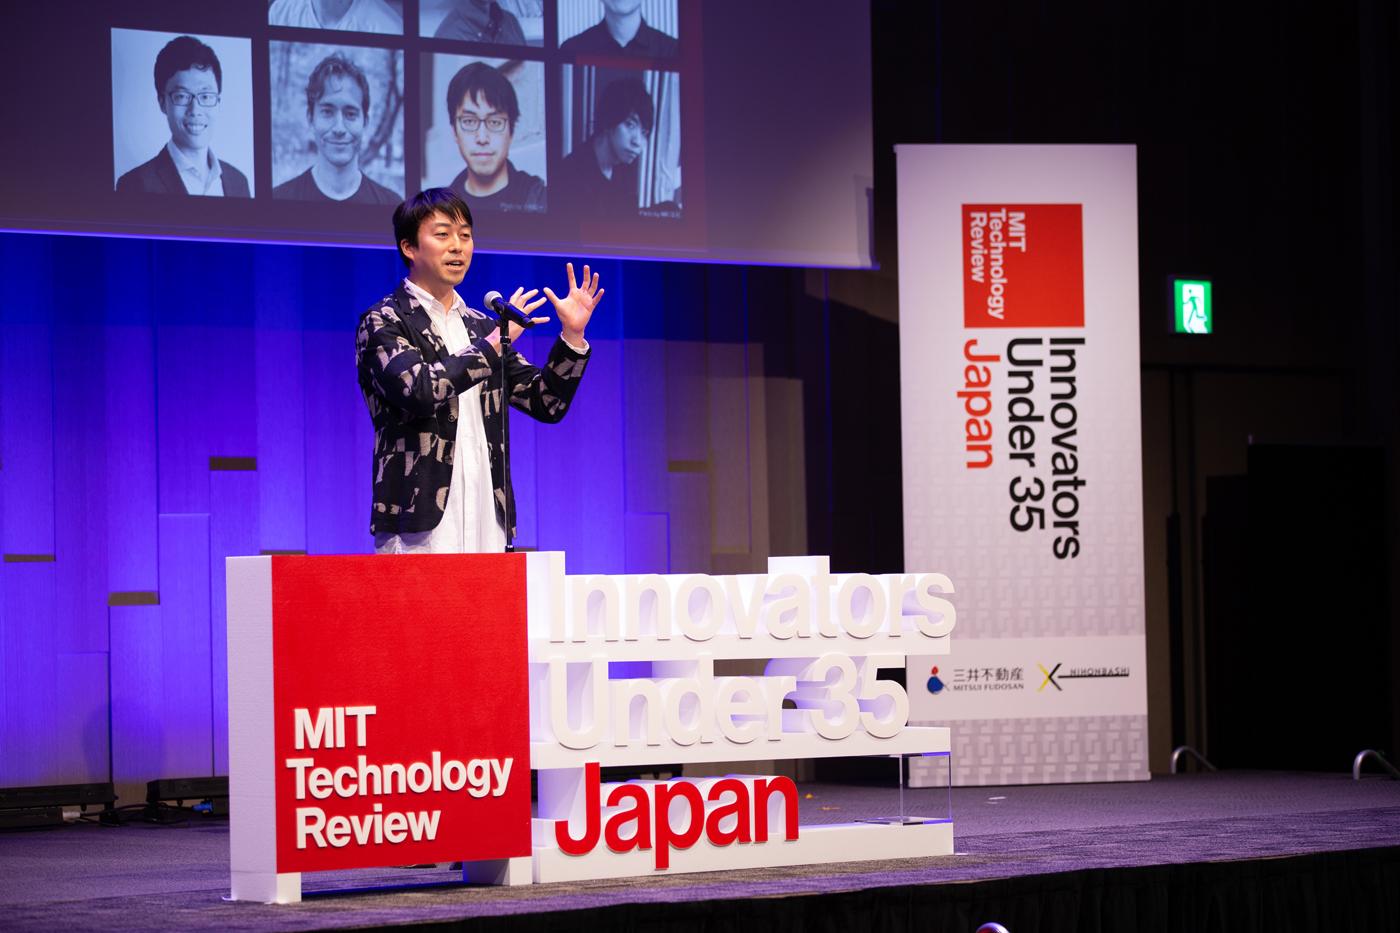 「Innovators Under 35 Japan」2021年度候補者募集のお知らせ